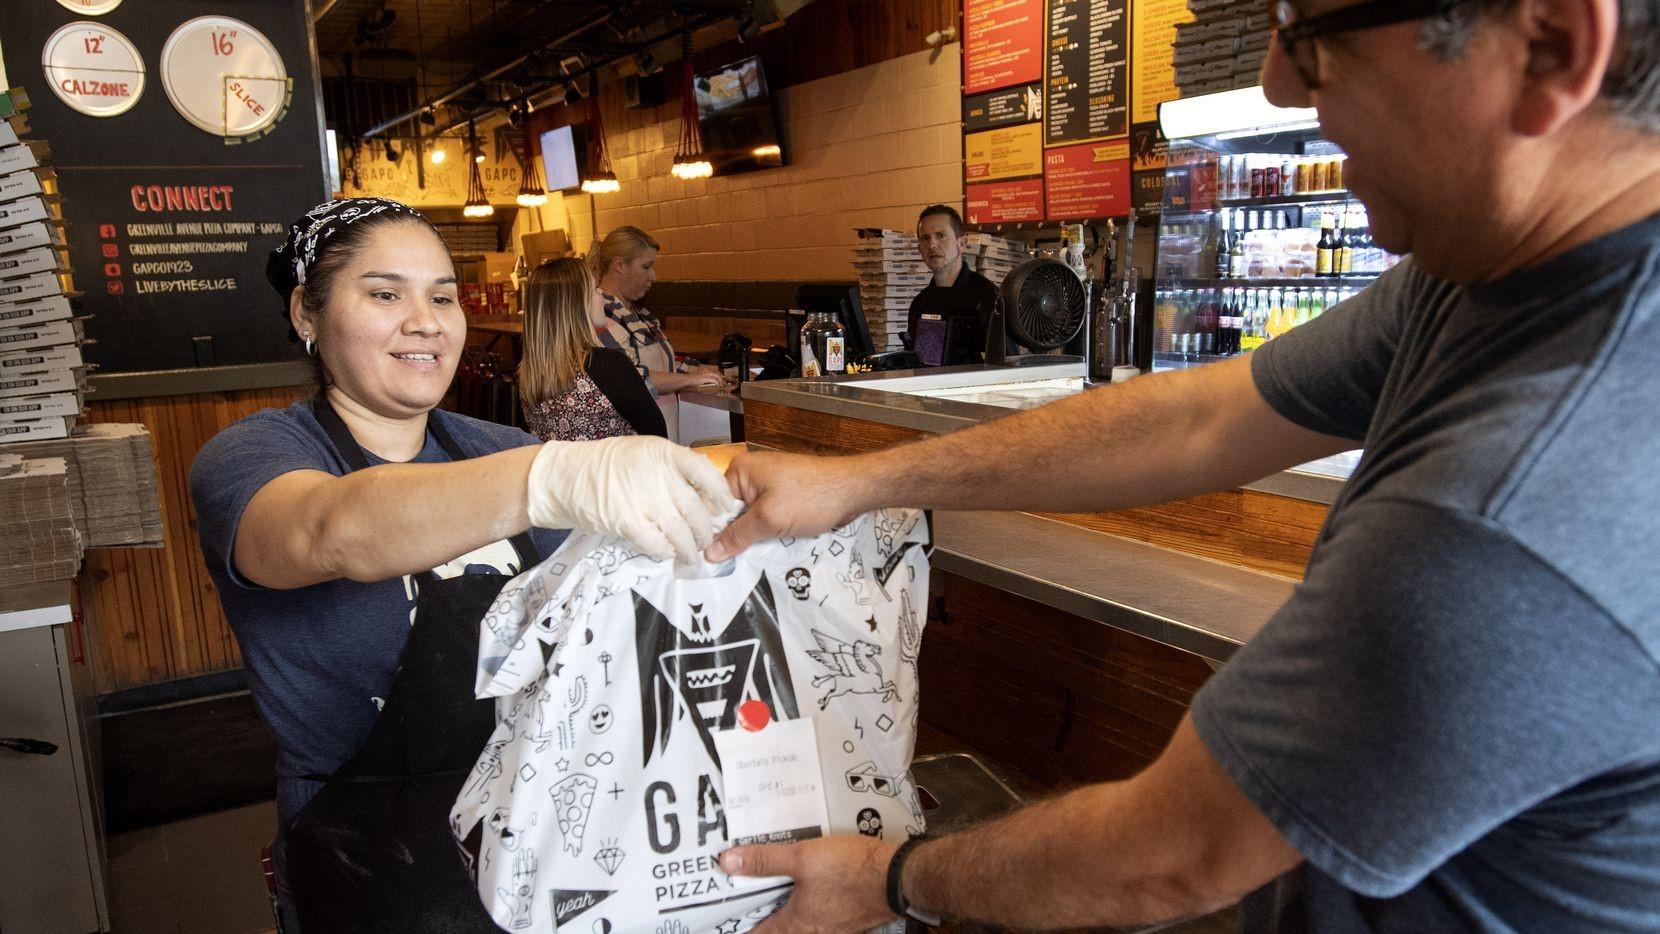 Restaurant worker handing over takeout bag